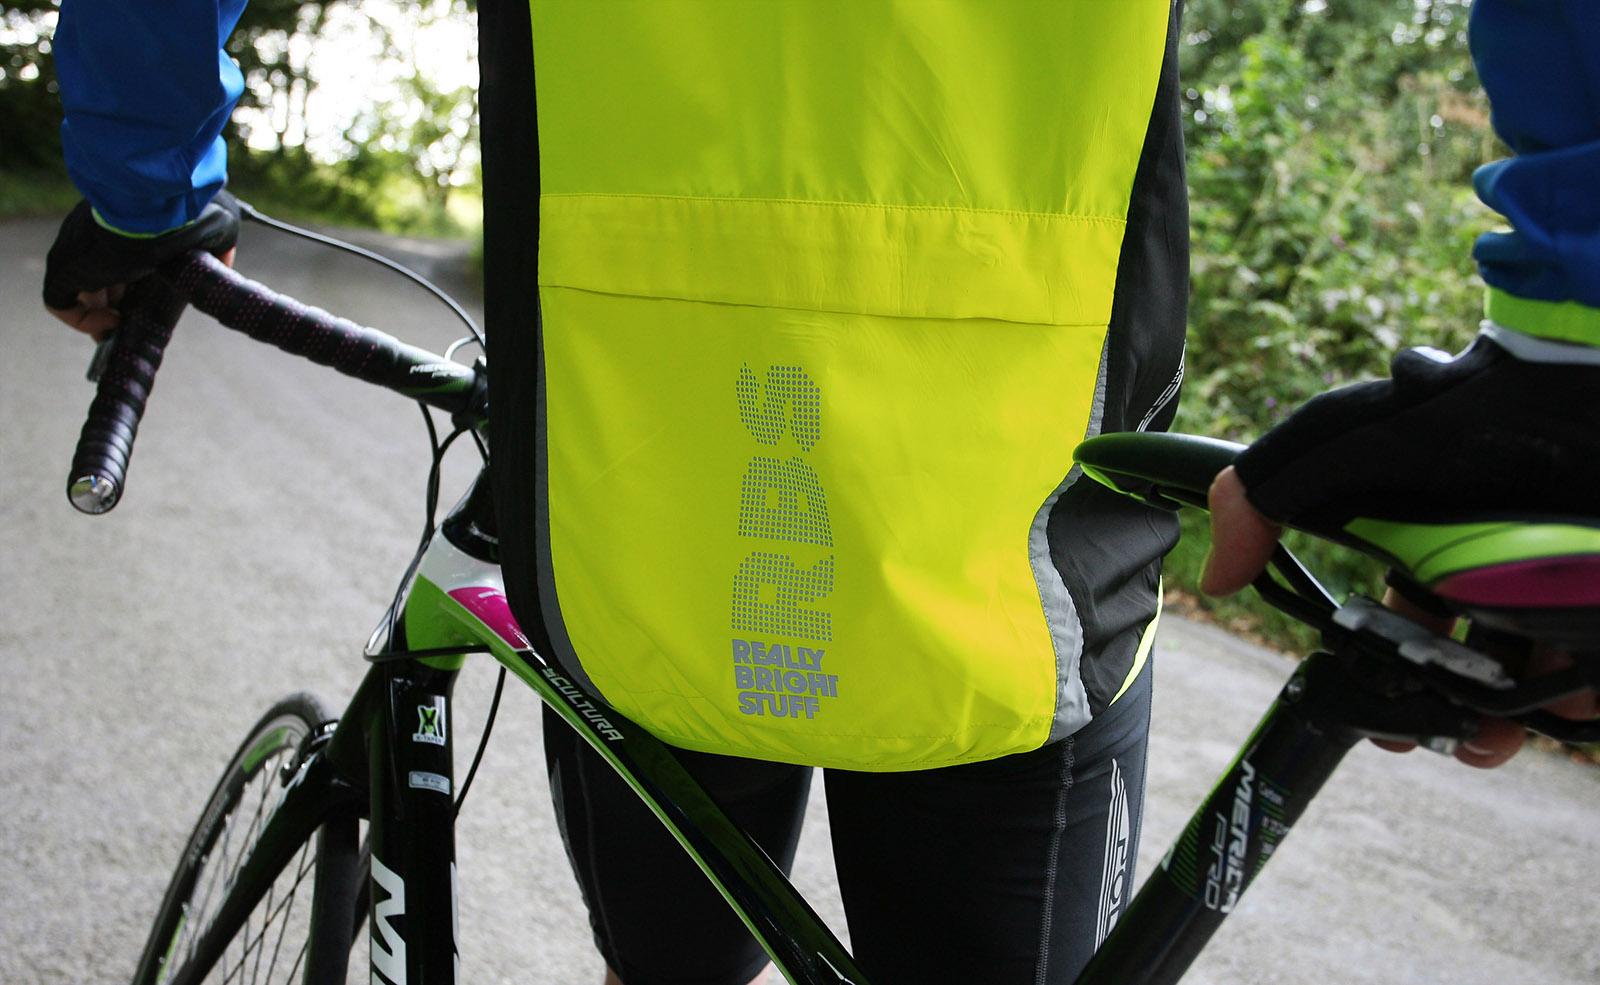 polaris bikewear rbs branding design by Leeds based Freelance Designer Neil Holroyd